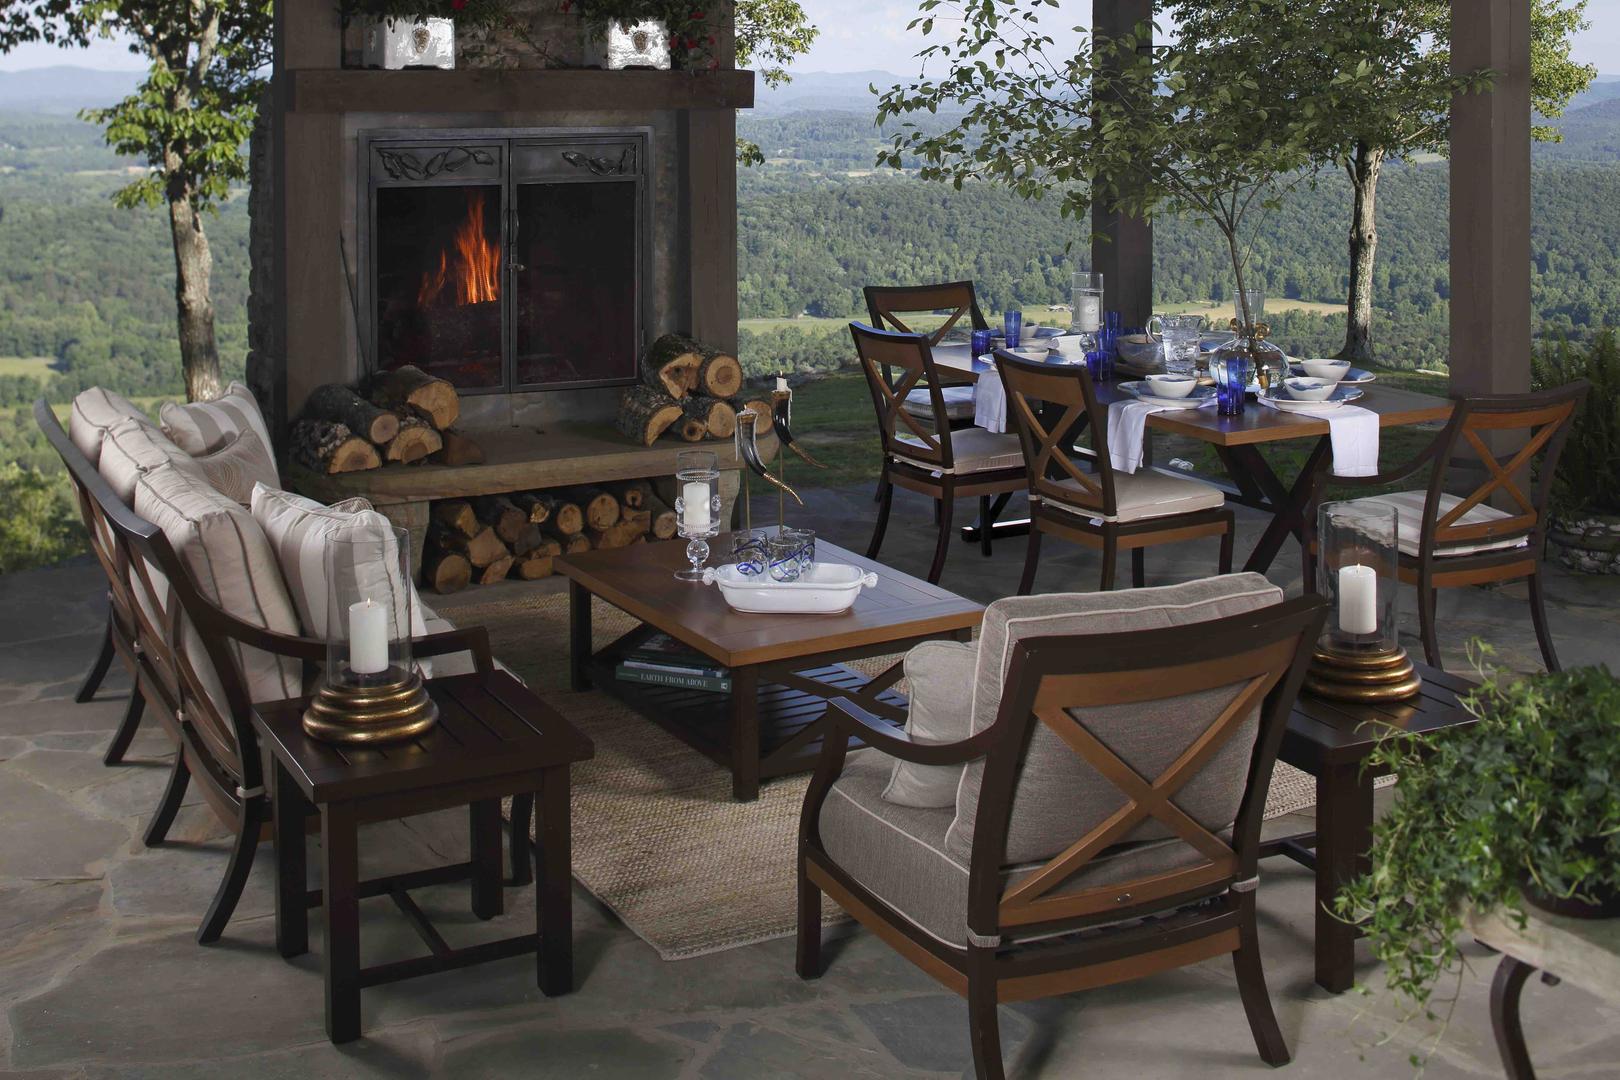 Kospia Farms Summer Classics Outdoor Furniture Lifes Best - Classic patio furniture